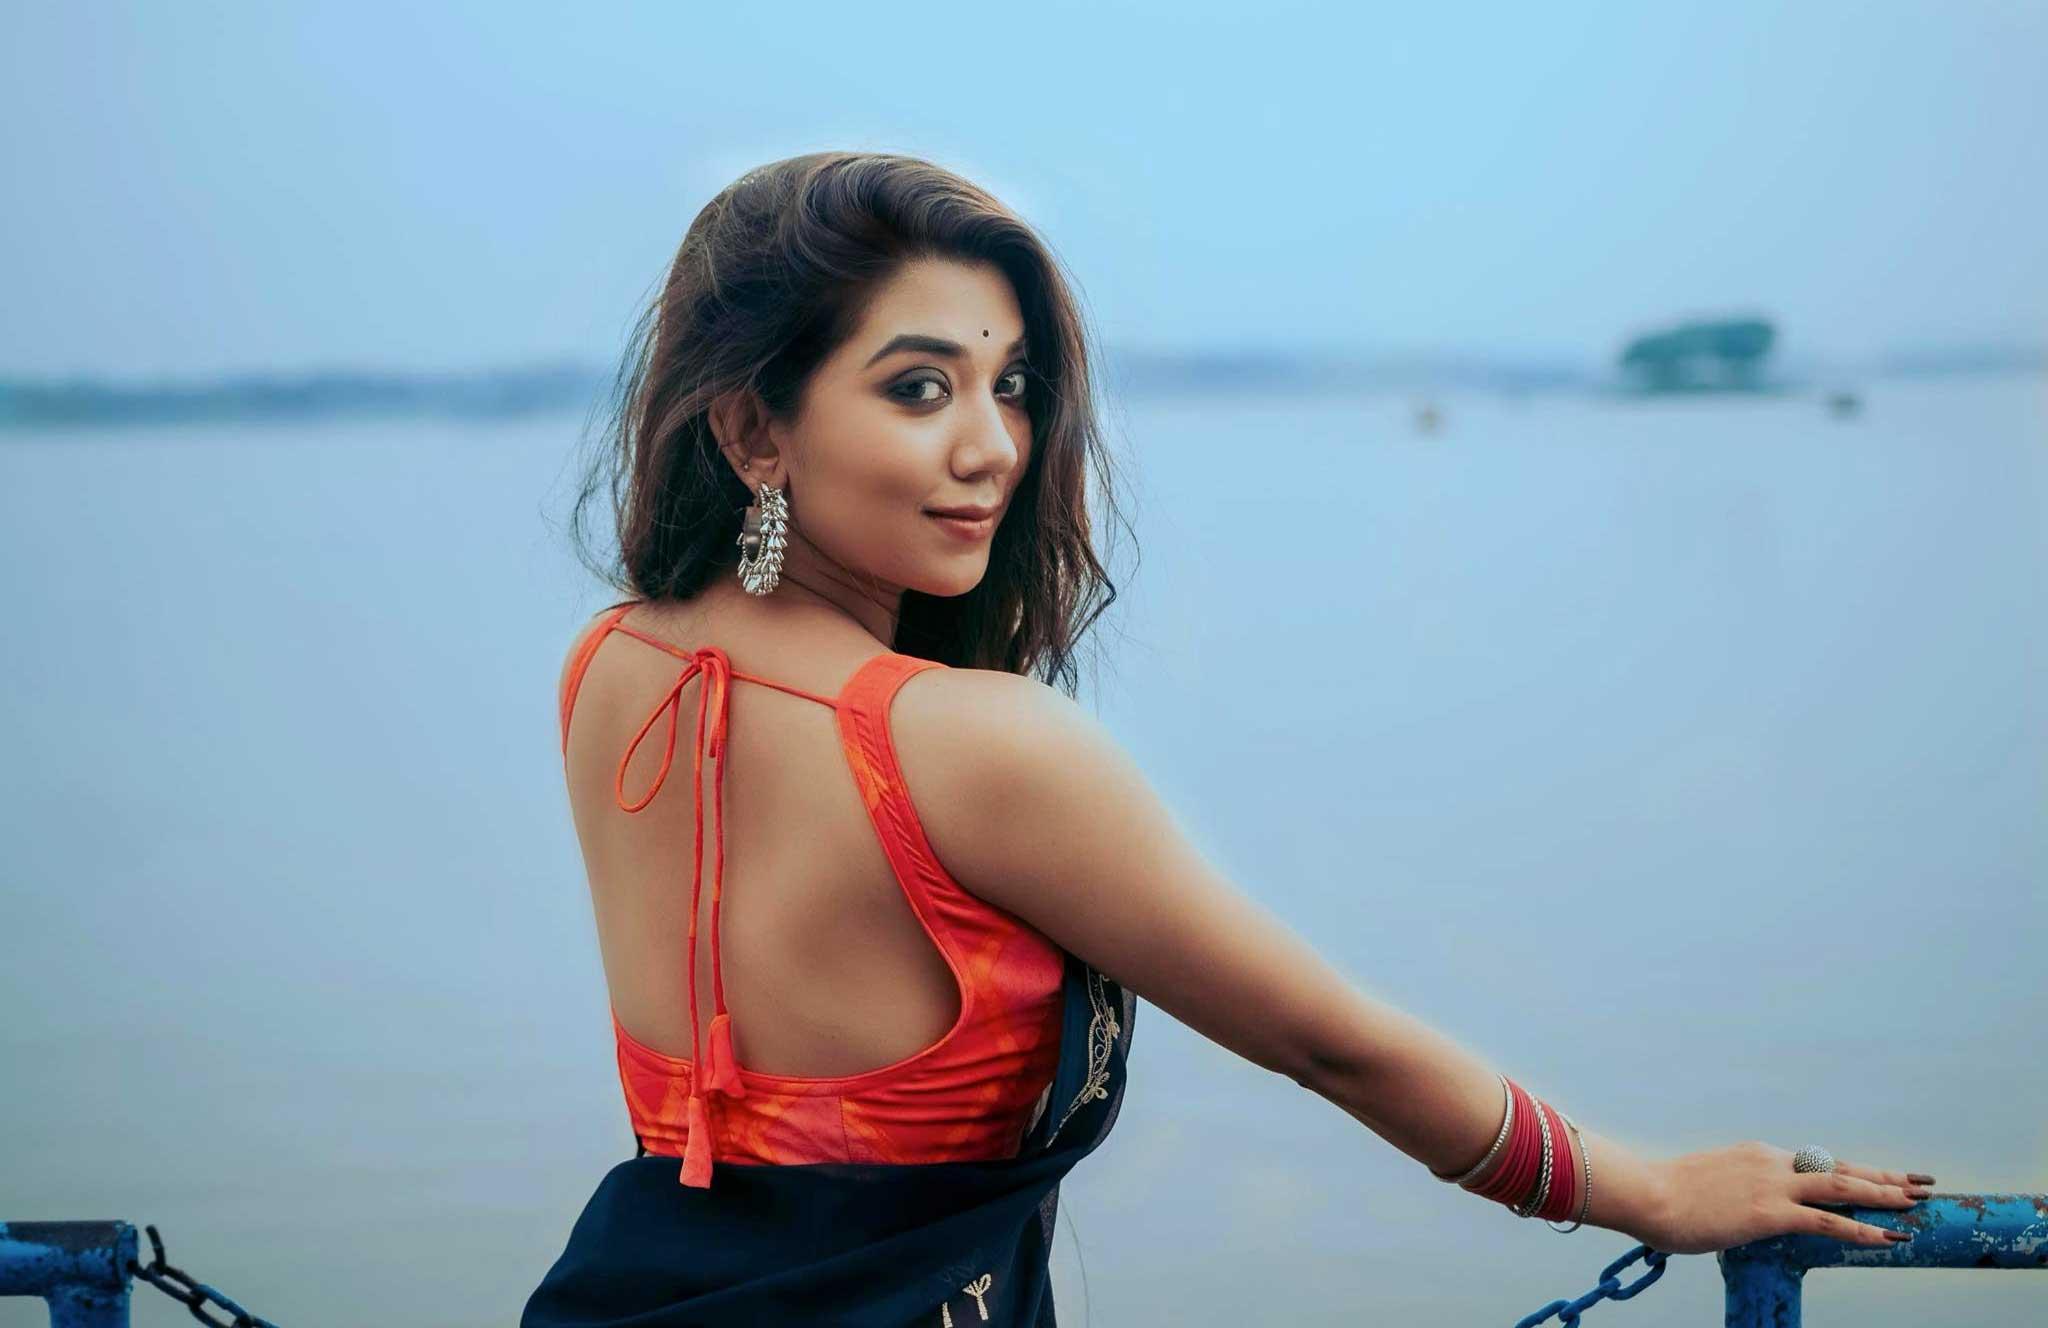 Facebook post of Sreetama Baidya